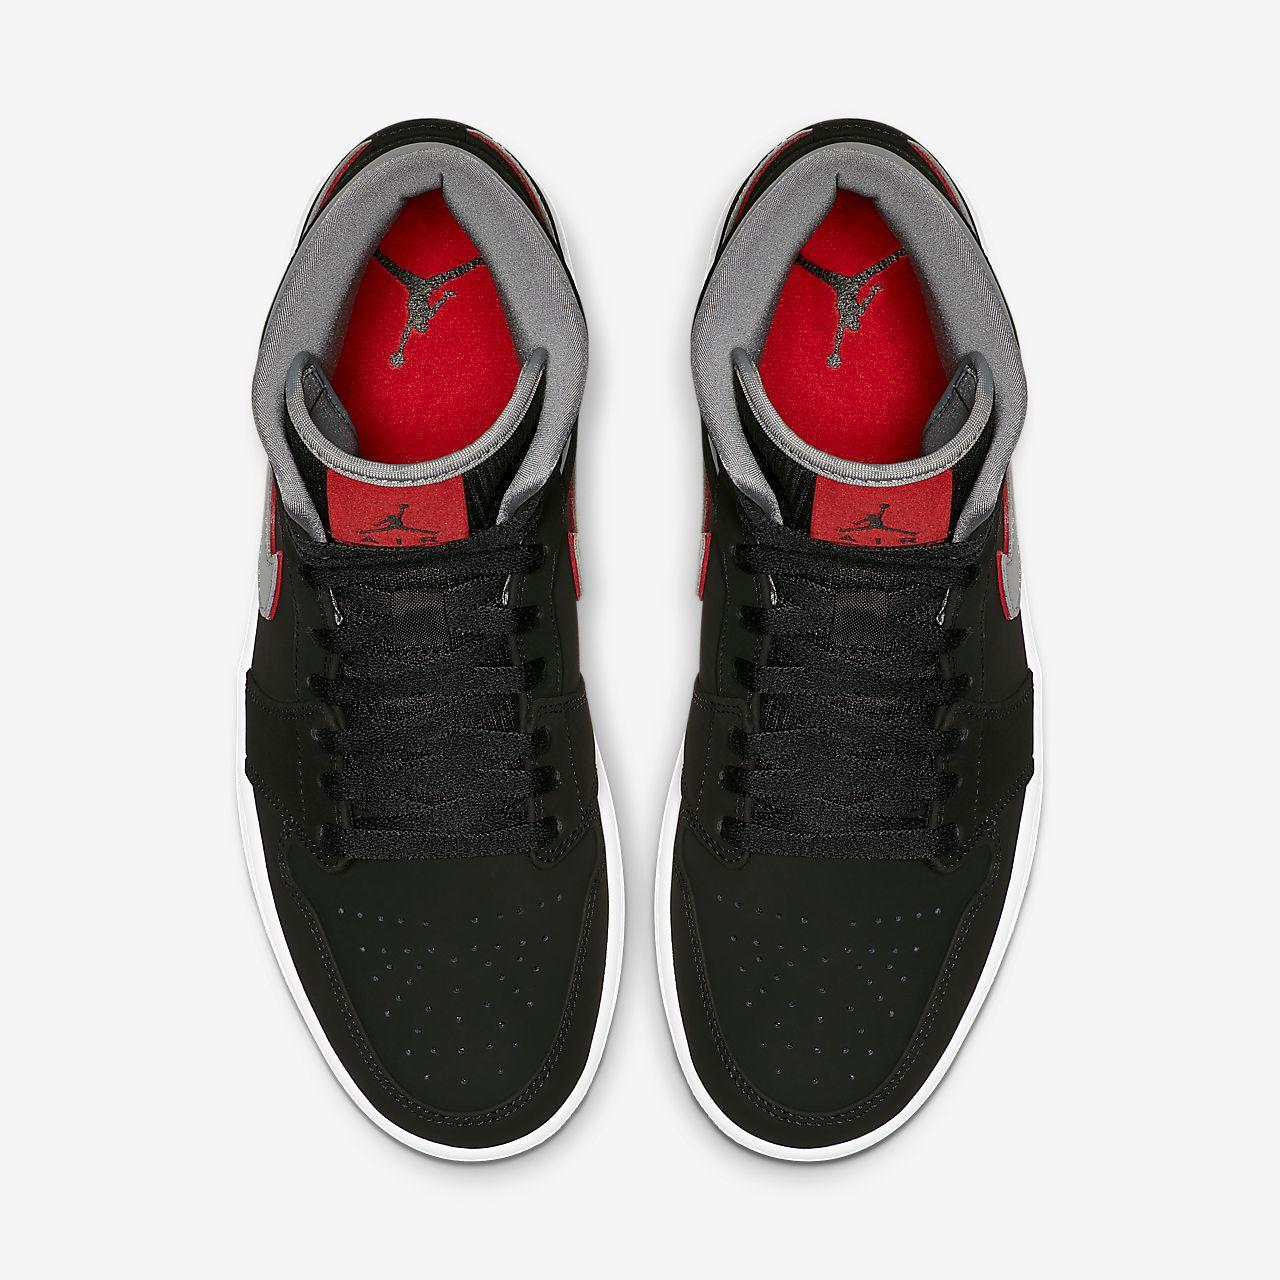 new product 0981b 51b5f ... Calzado para hombre Air Jordan 1 Mid